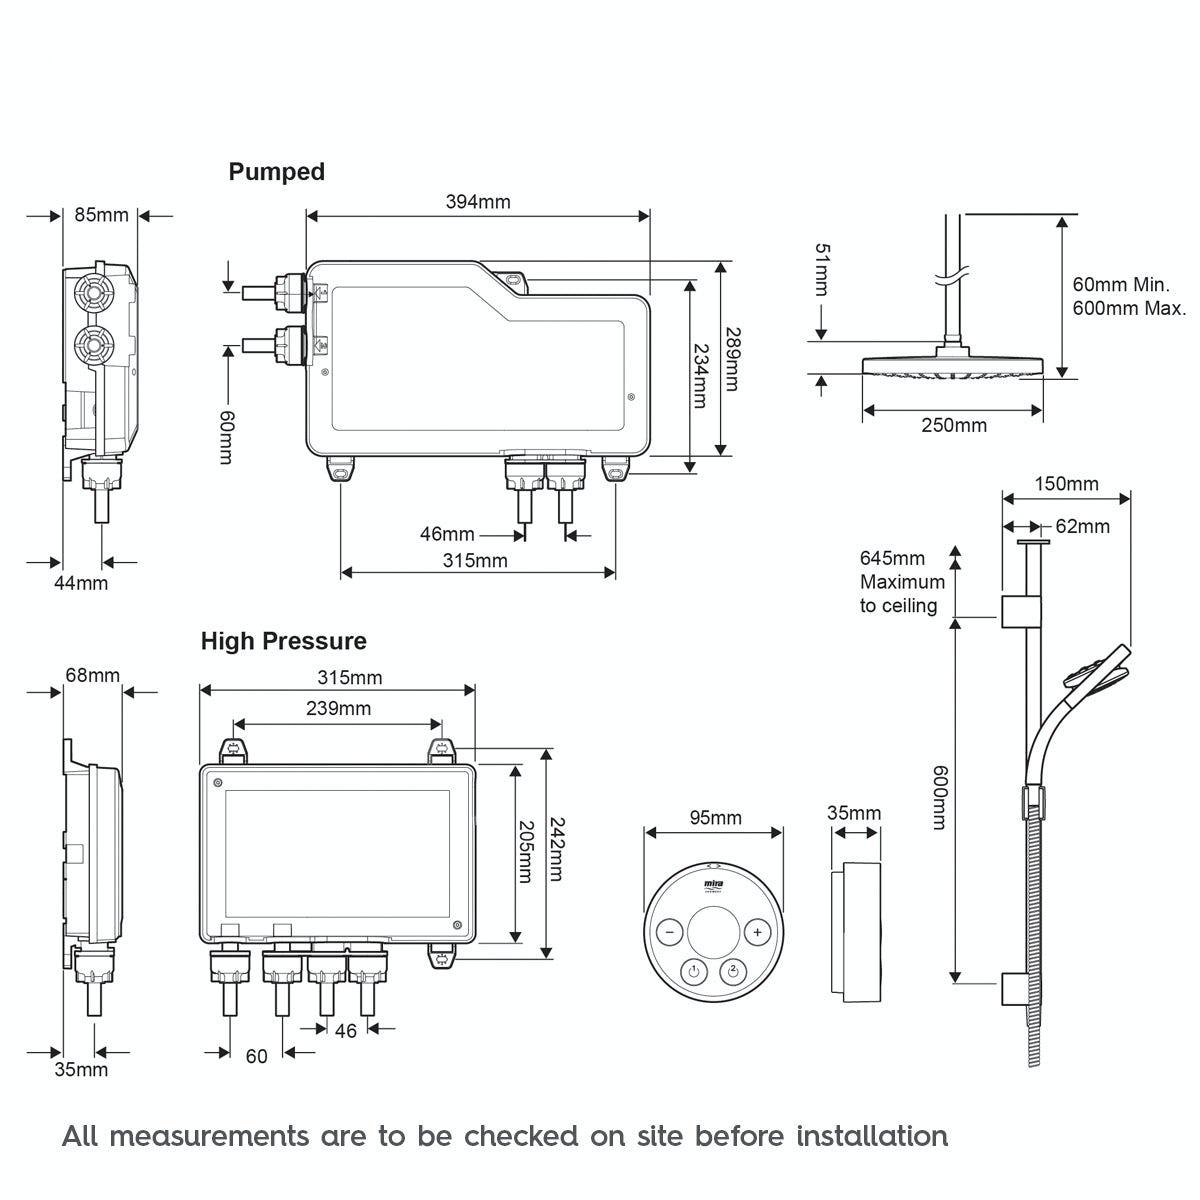 Dimensions for Mira Platinum dual ceiling fed digital shower standard